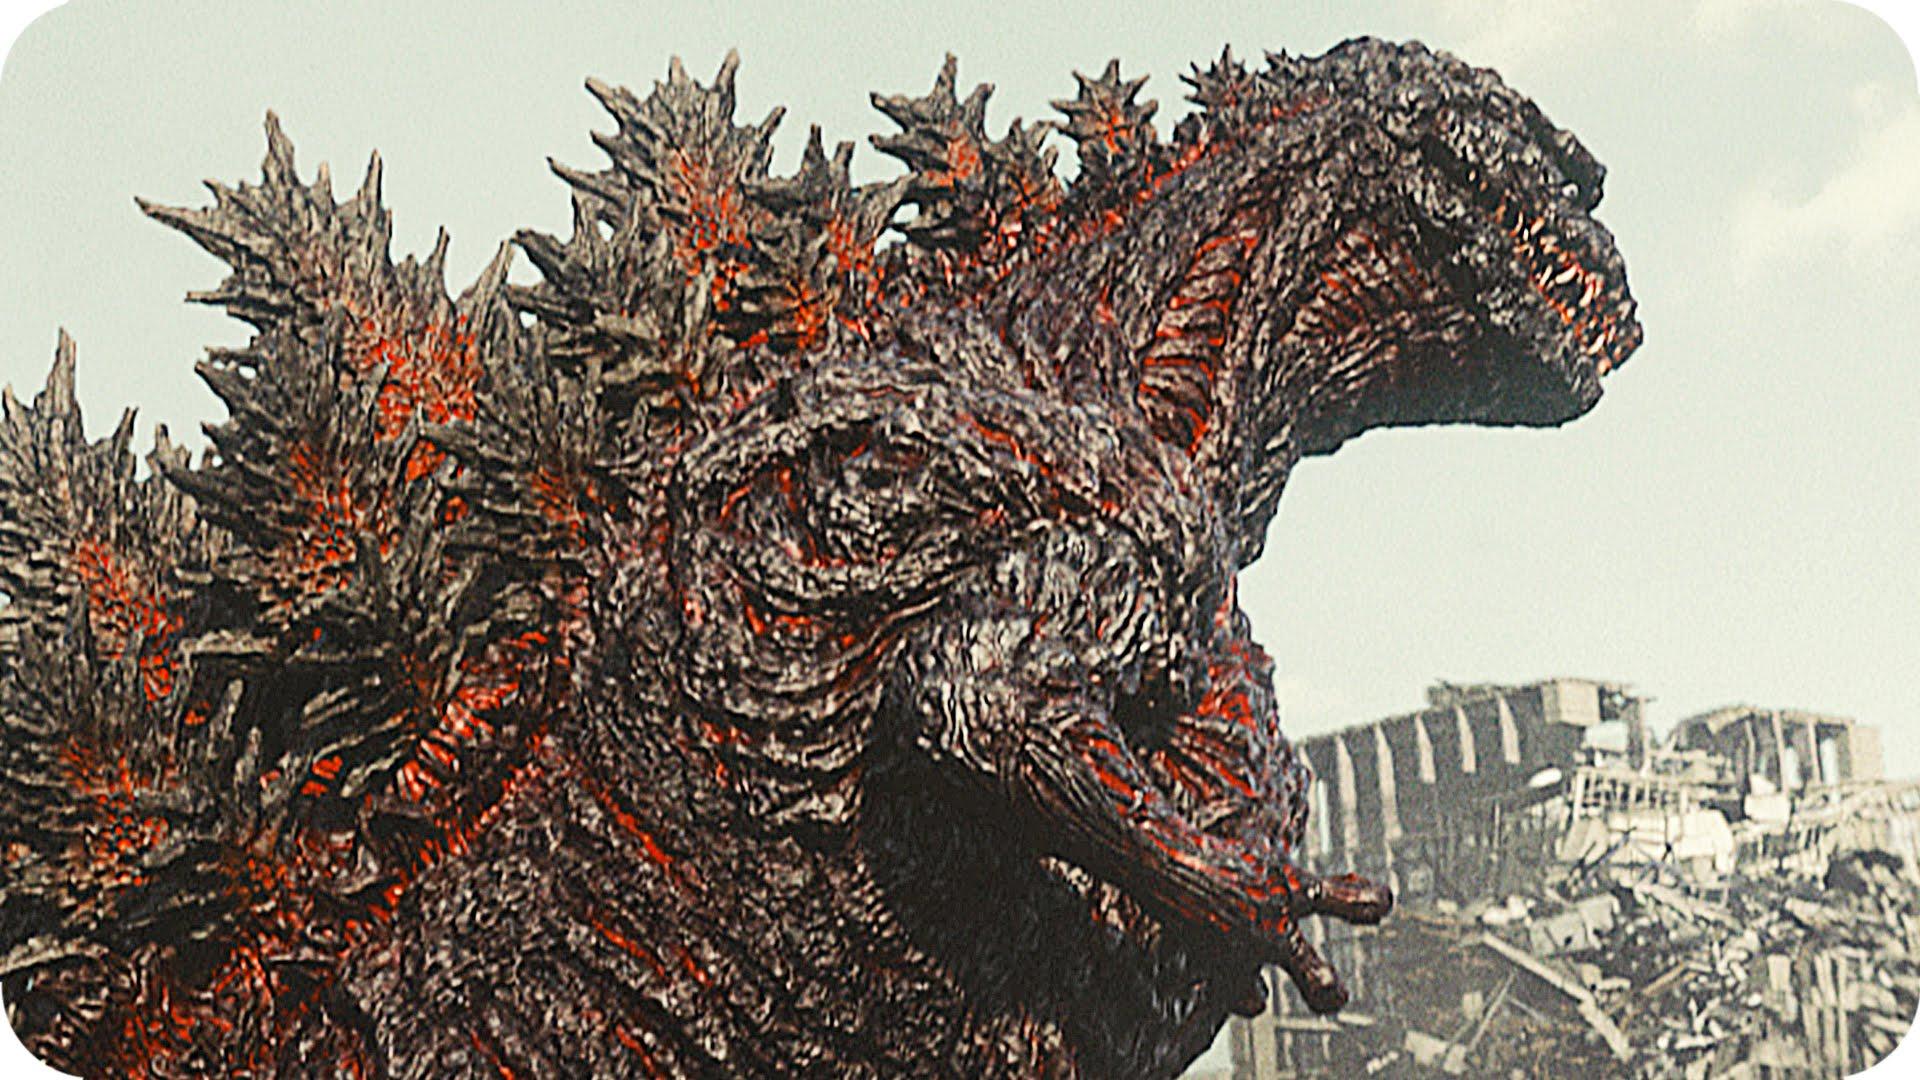 1920x1080 > Godzilla Wallpapers